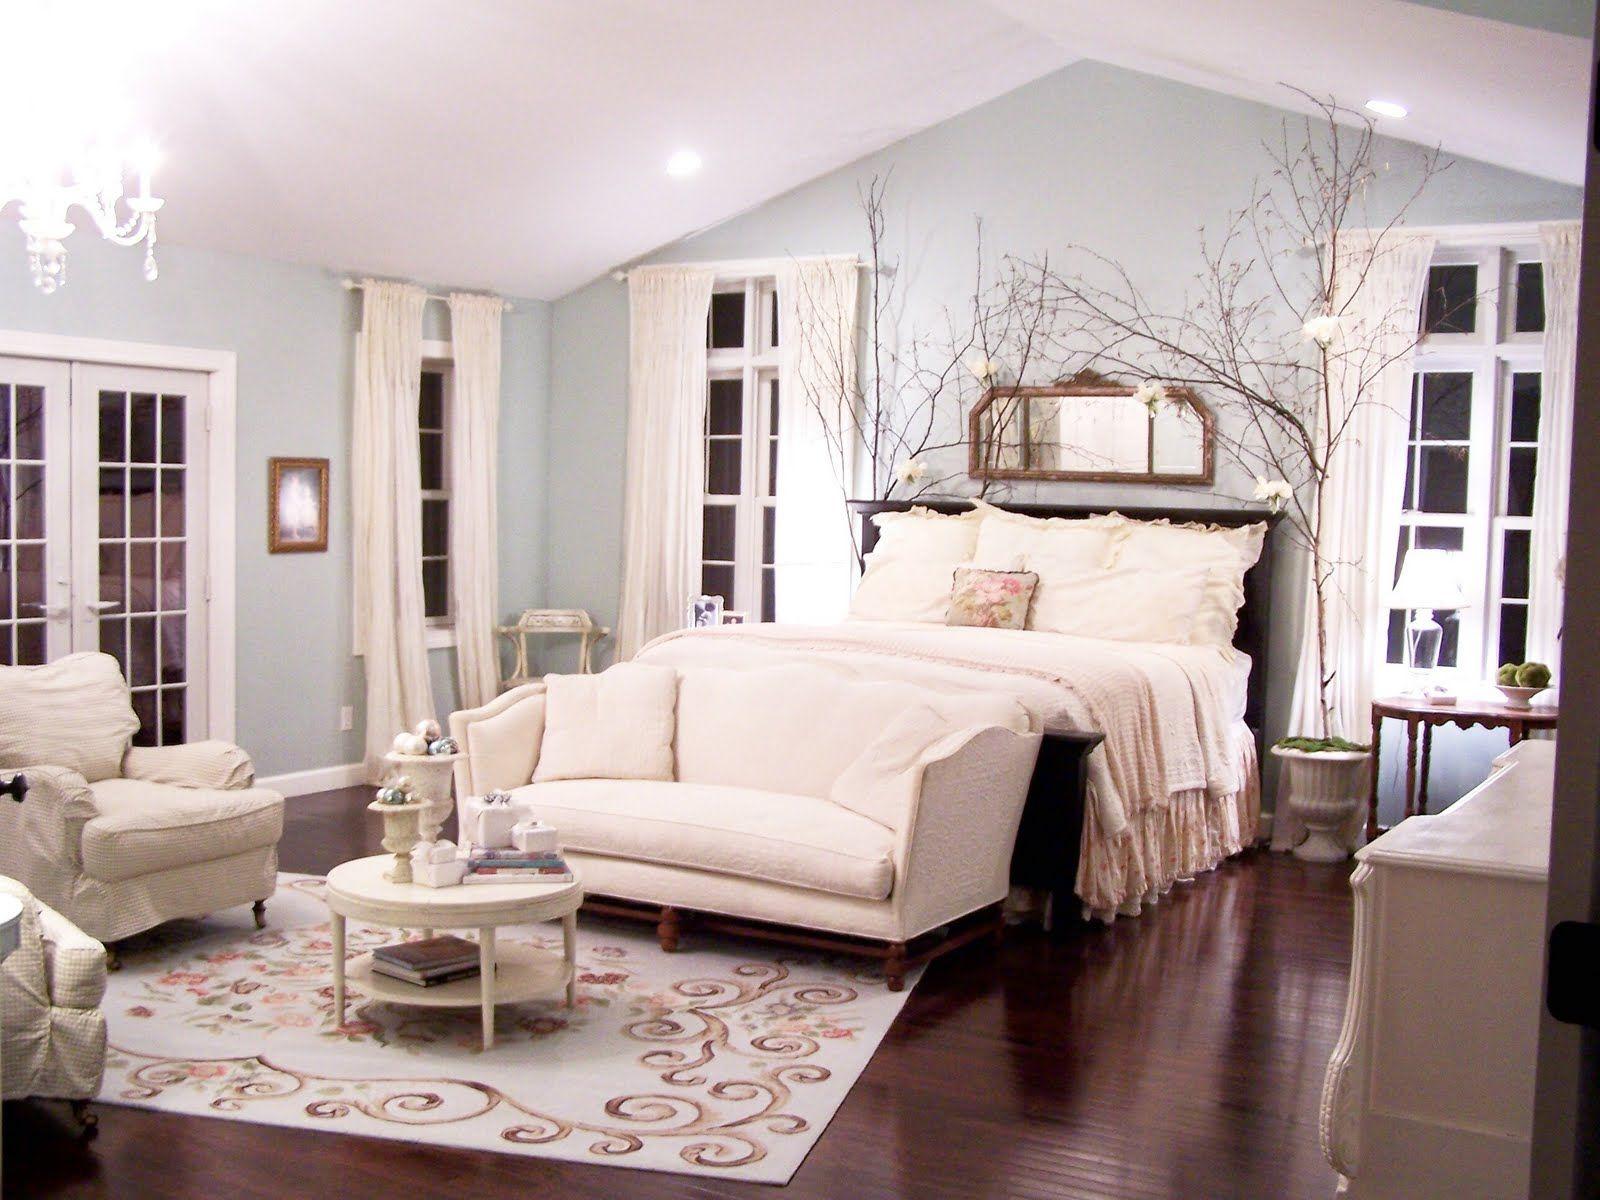 Lovely on trend bedroom designu2014esp like the trees